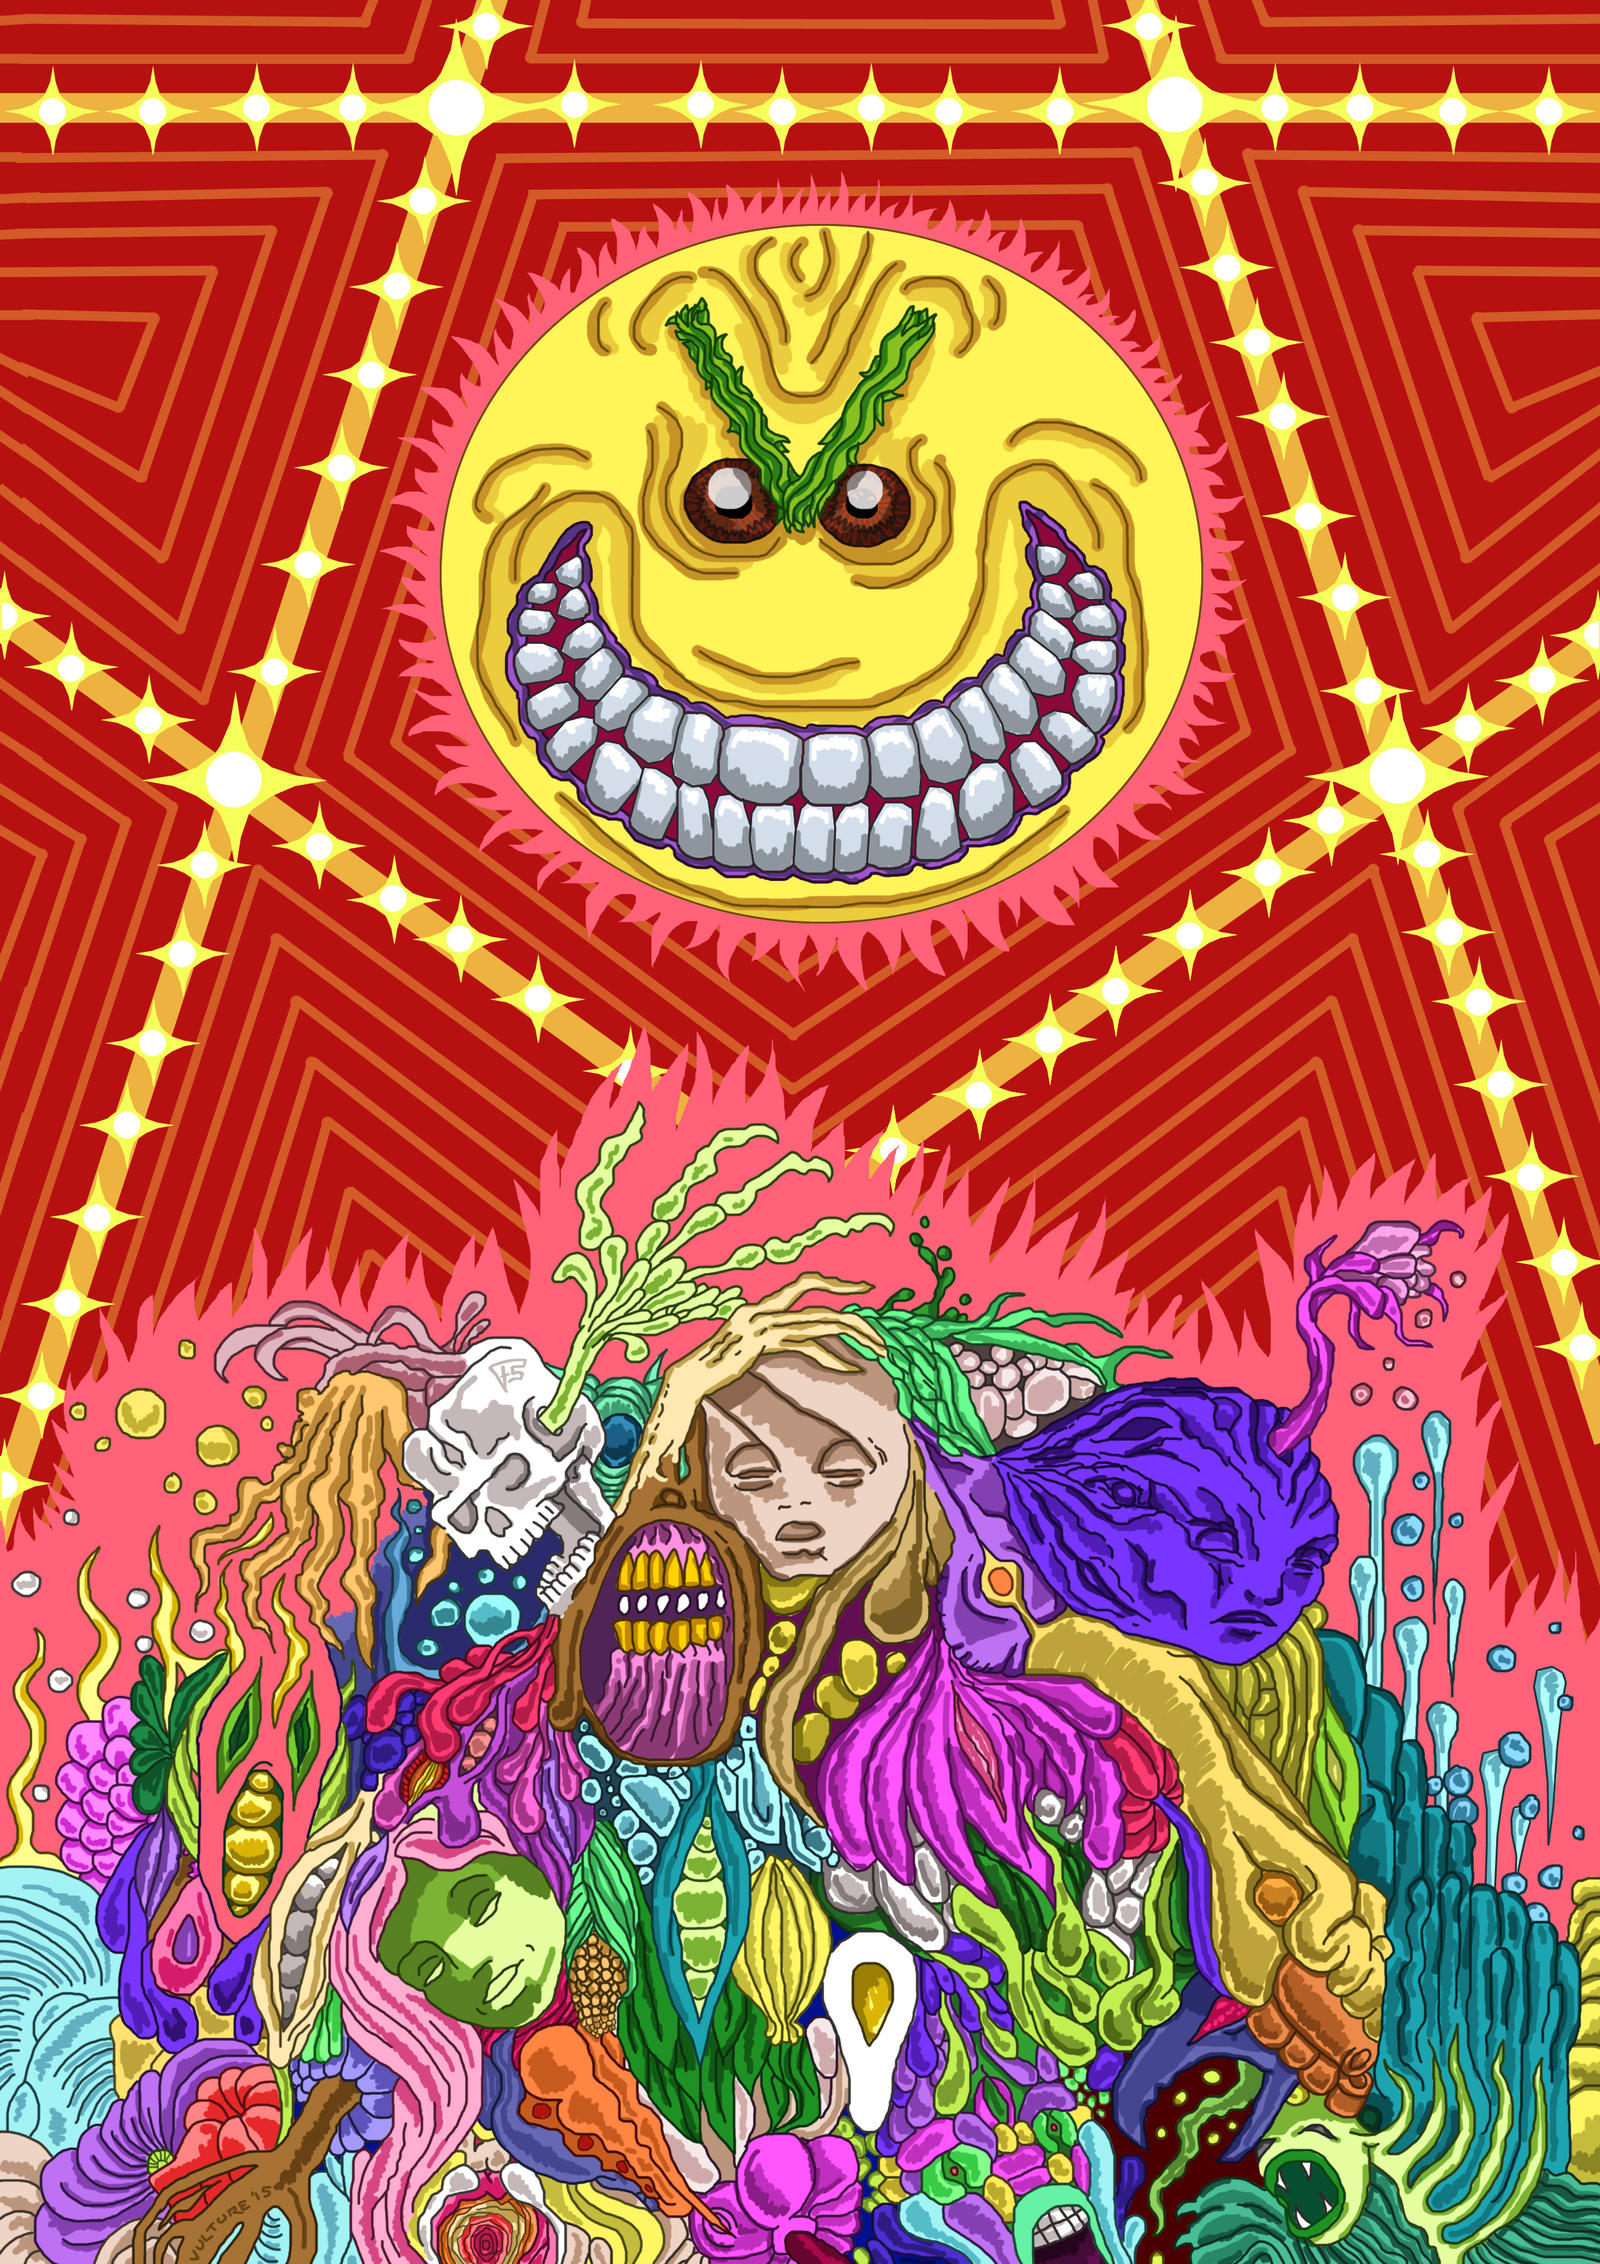 Trolling Sun by Brainstorm-bw-style